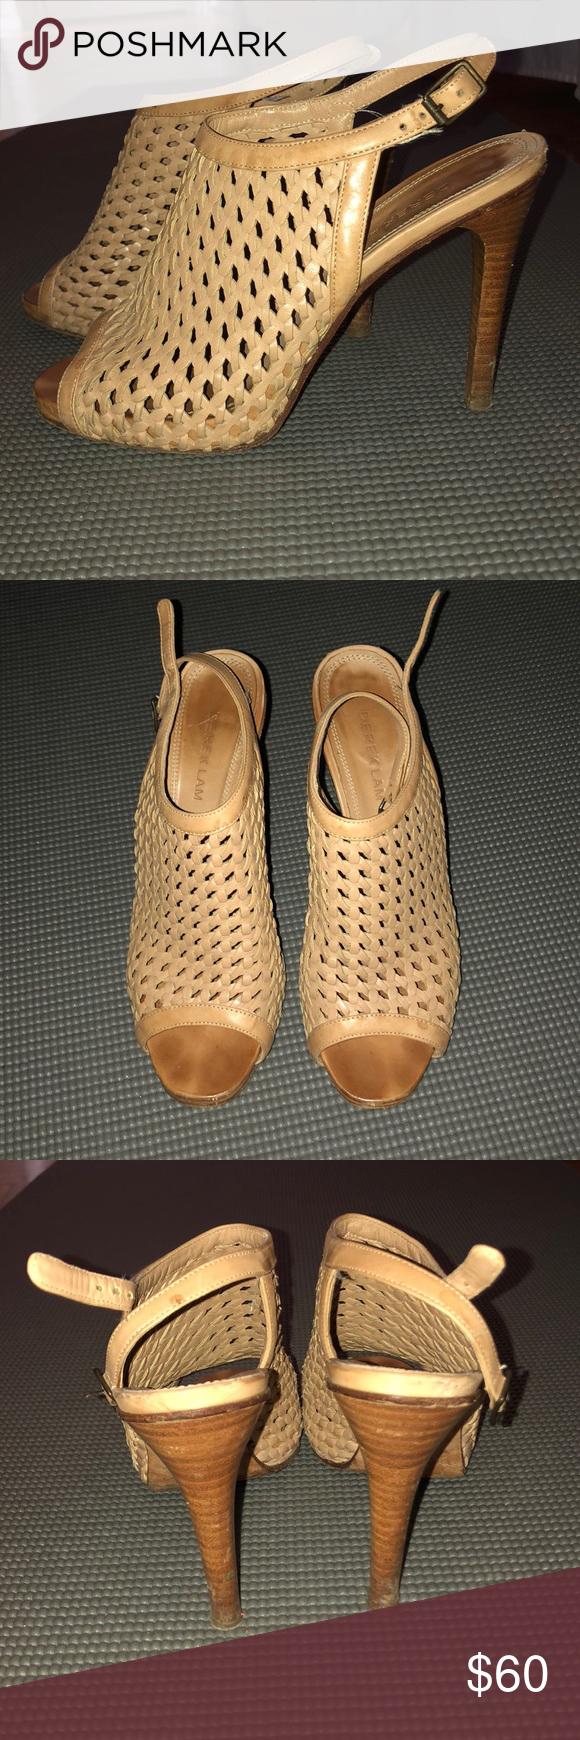 Derek Lam Basket Weave Peeptoe Sandals Size 38 Super chic Derek Lam basketweave peeptoe sandals.  In...